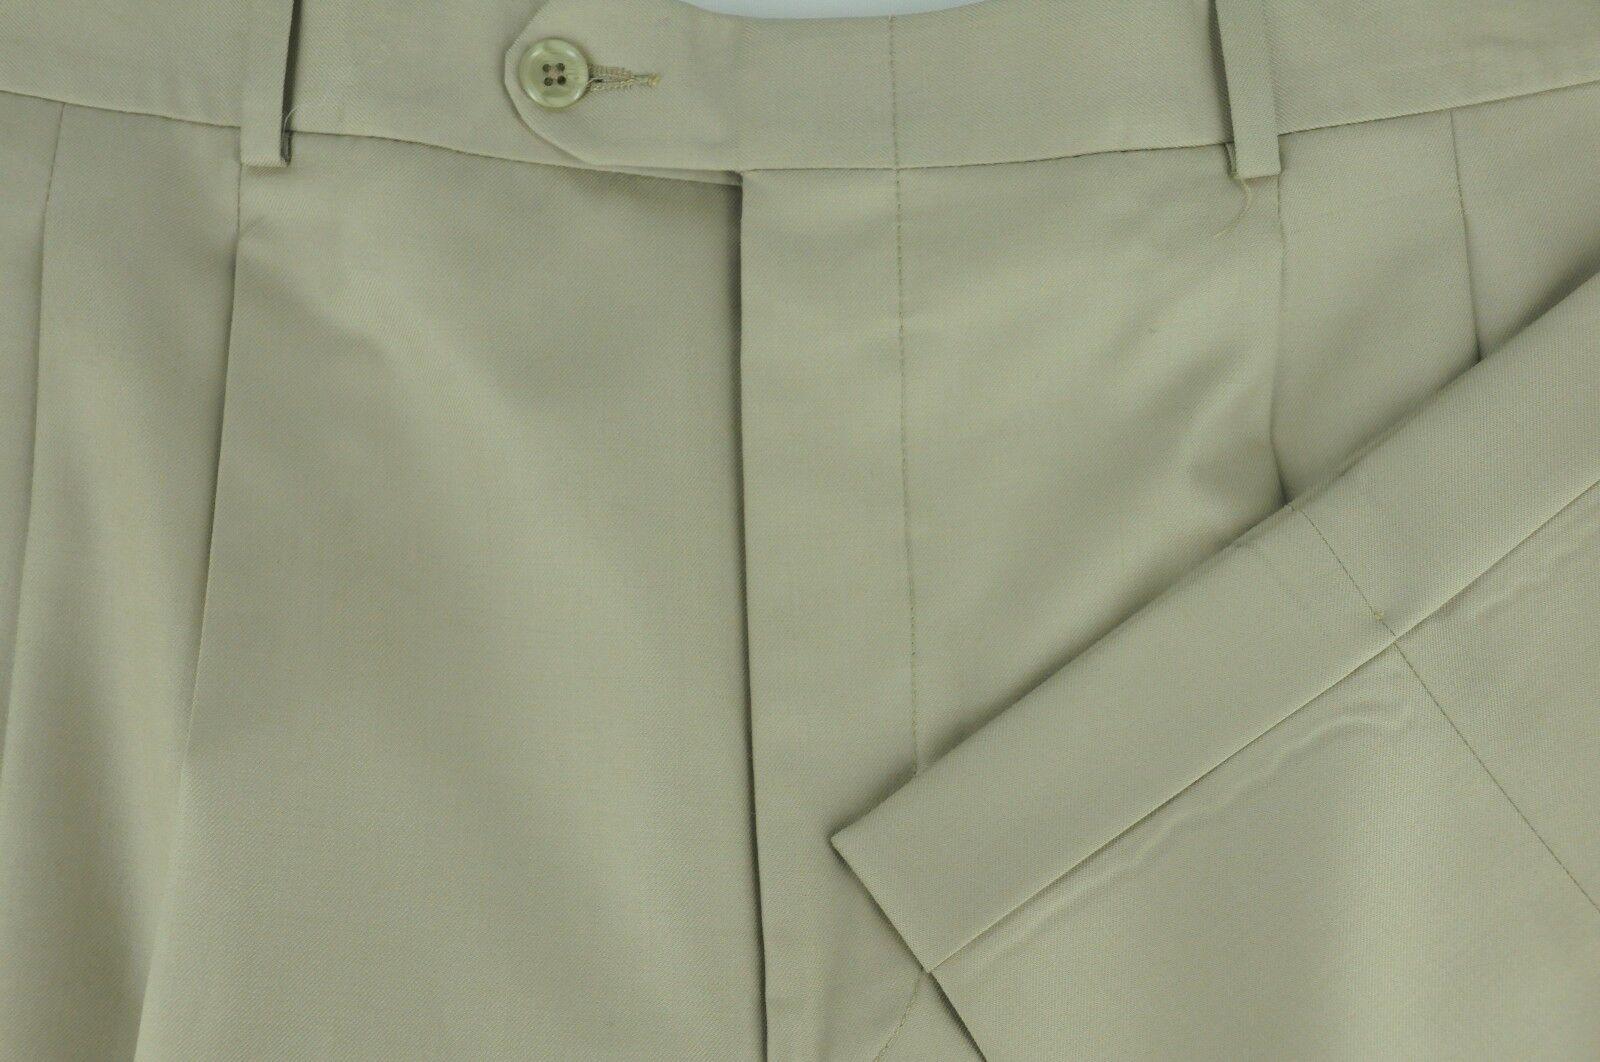 Corbin Men's Light Khaki All Season Wool Pleated Dress Pants 36 x 30